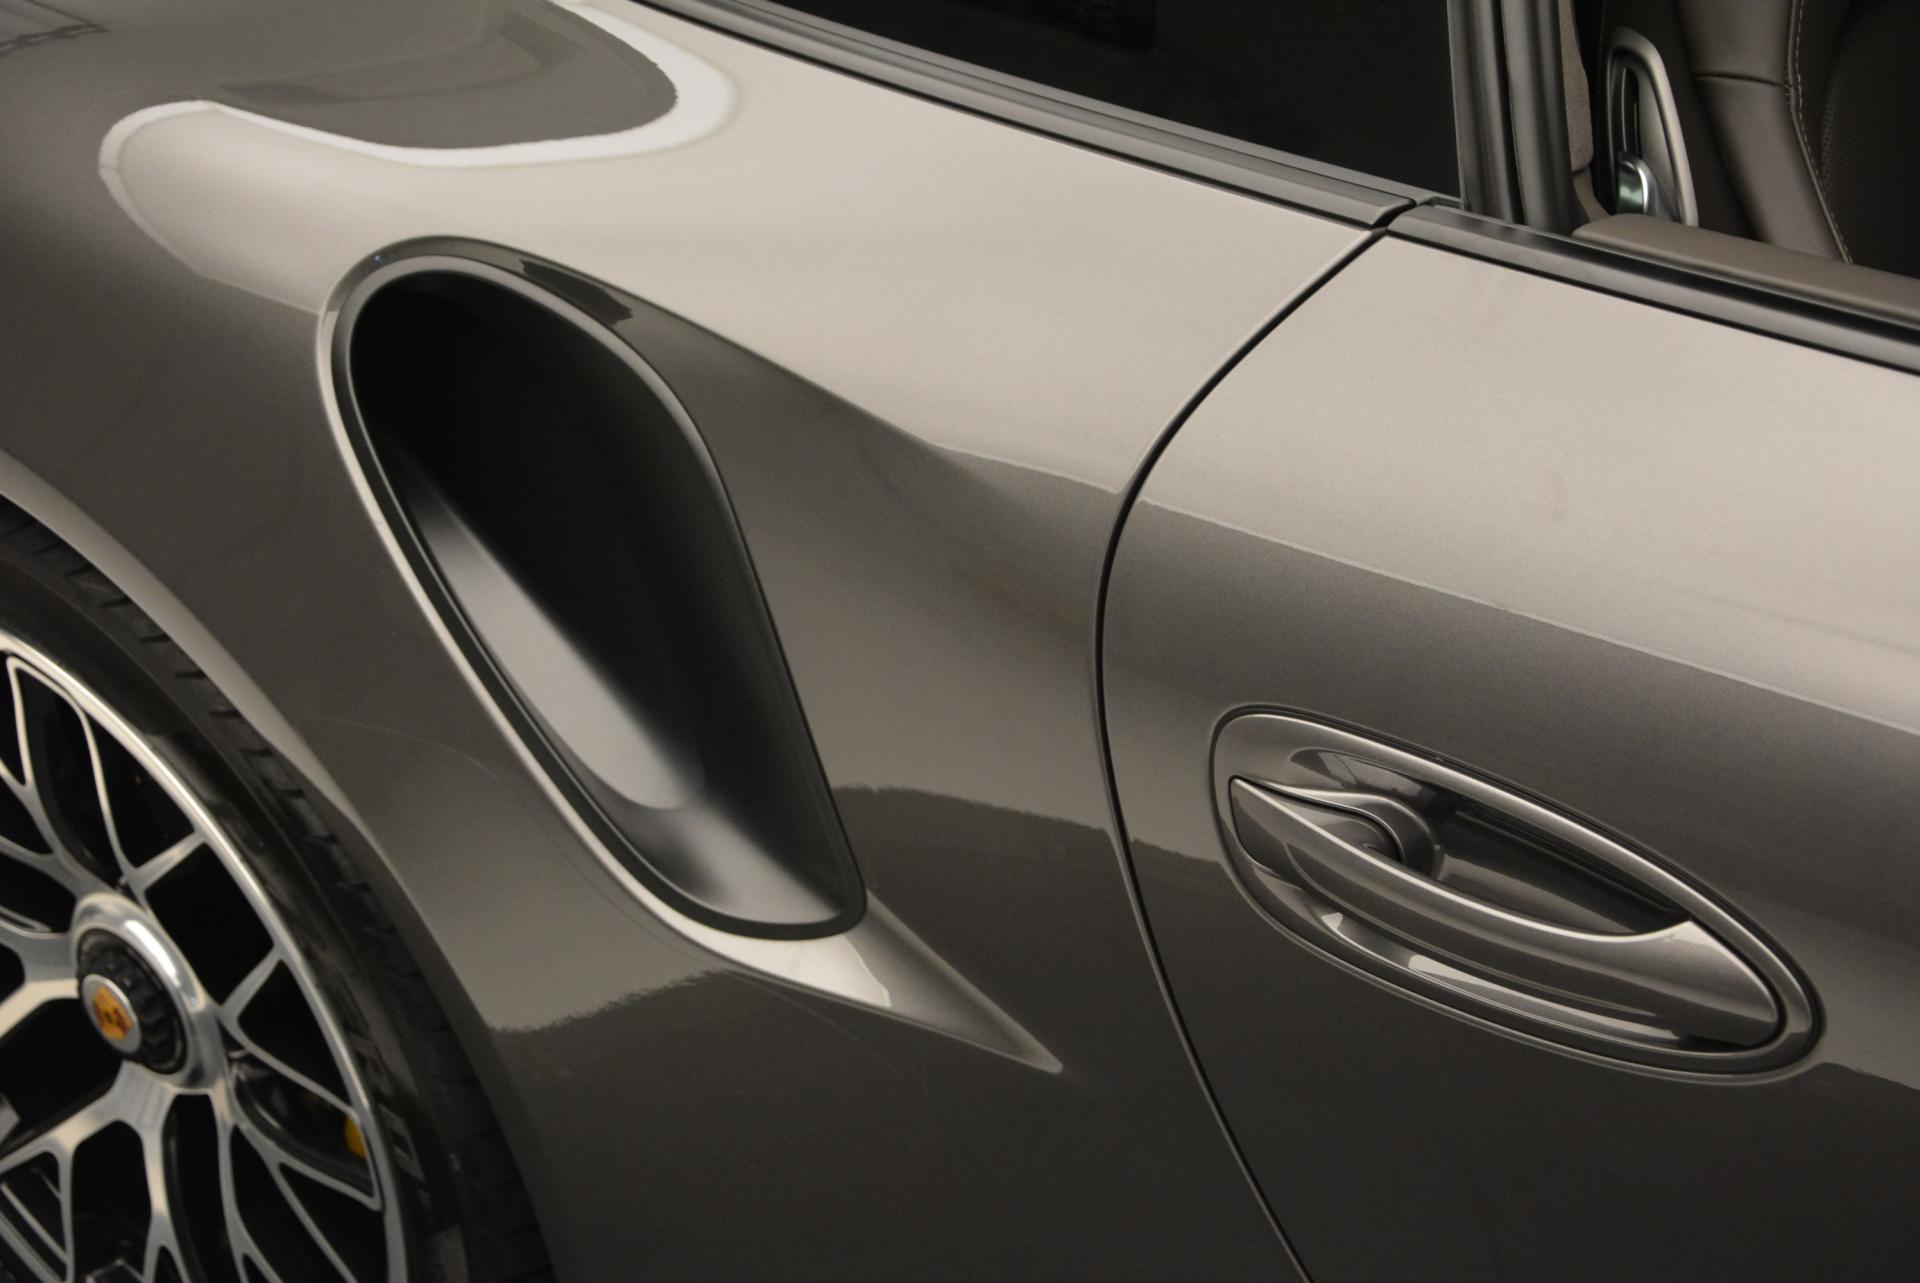 Used 2014 Porsche 911 Turbo S For Sale In Greenwich, CT 113_p22